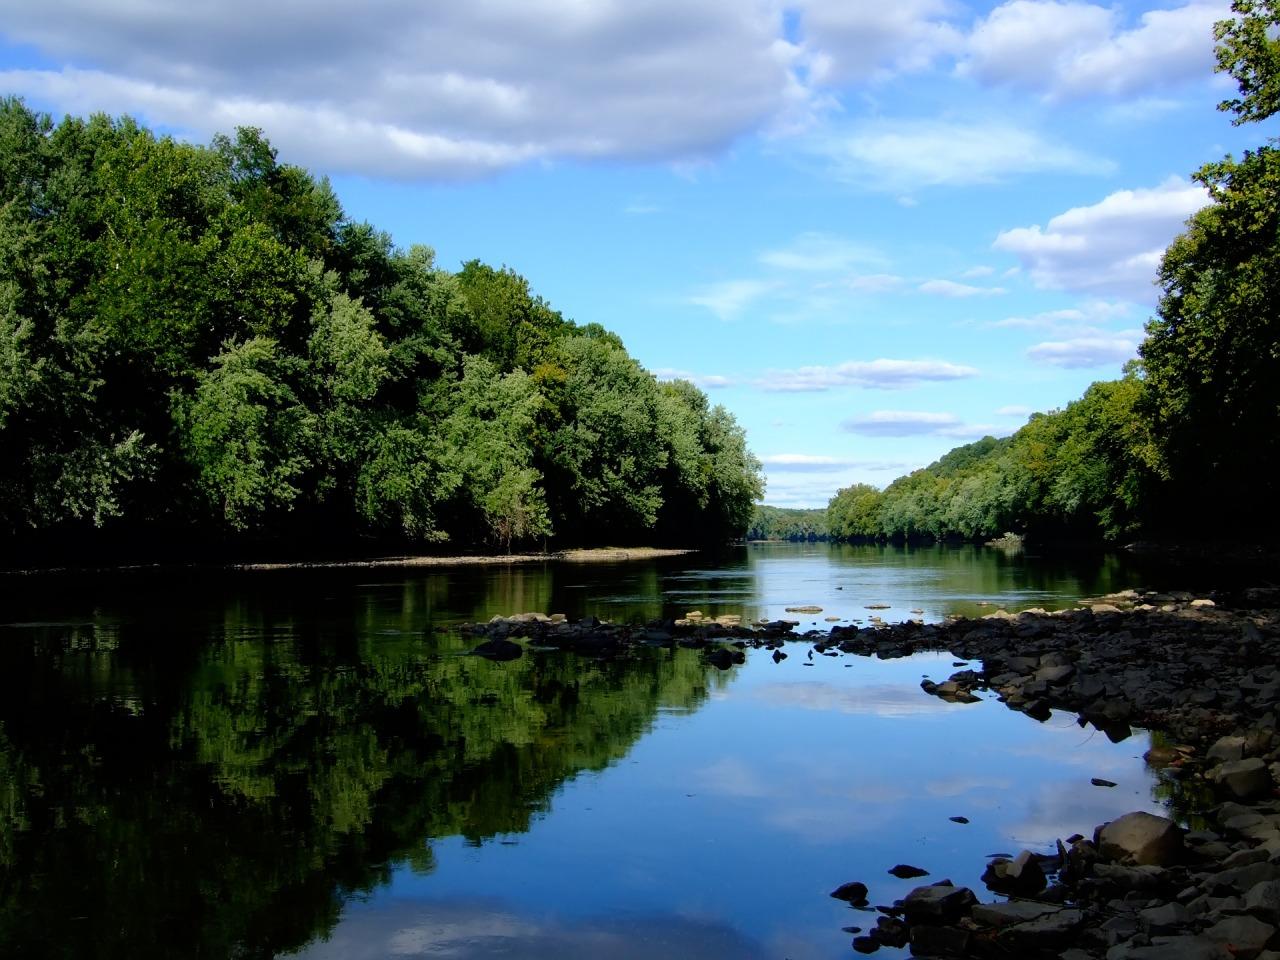 River Wallpapers; River Wallpapers; River Wallpapers ...